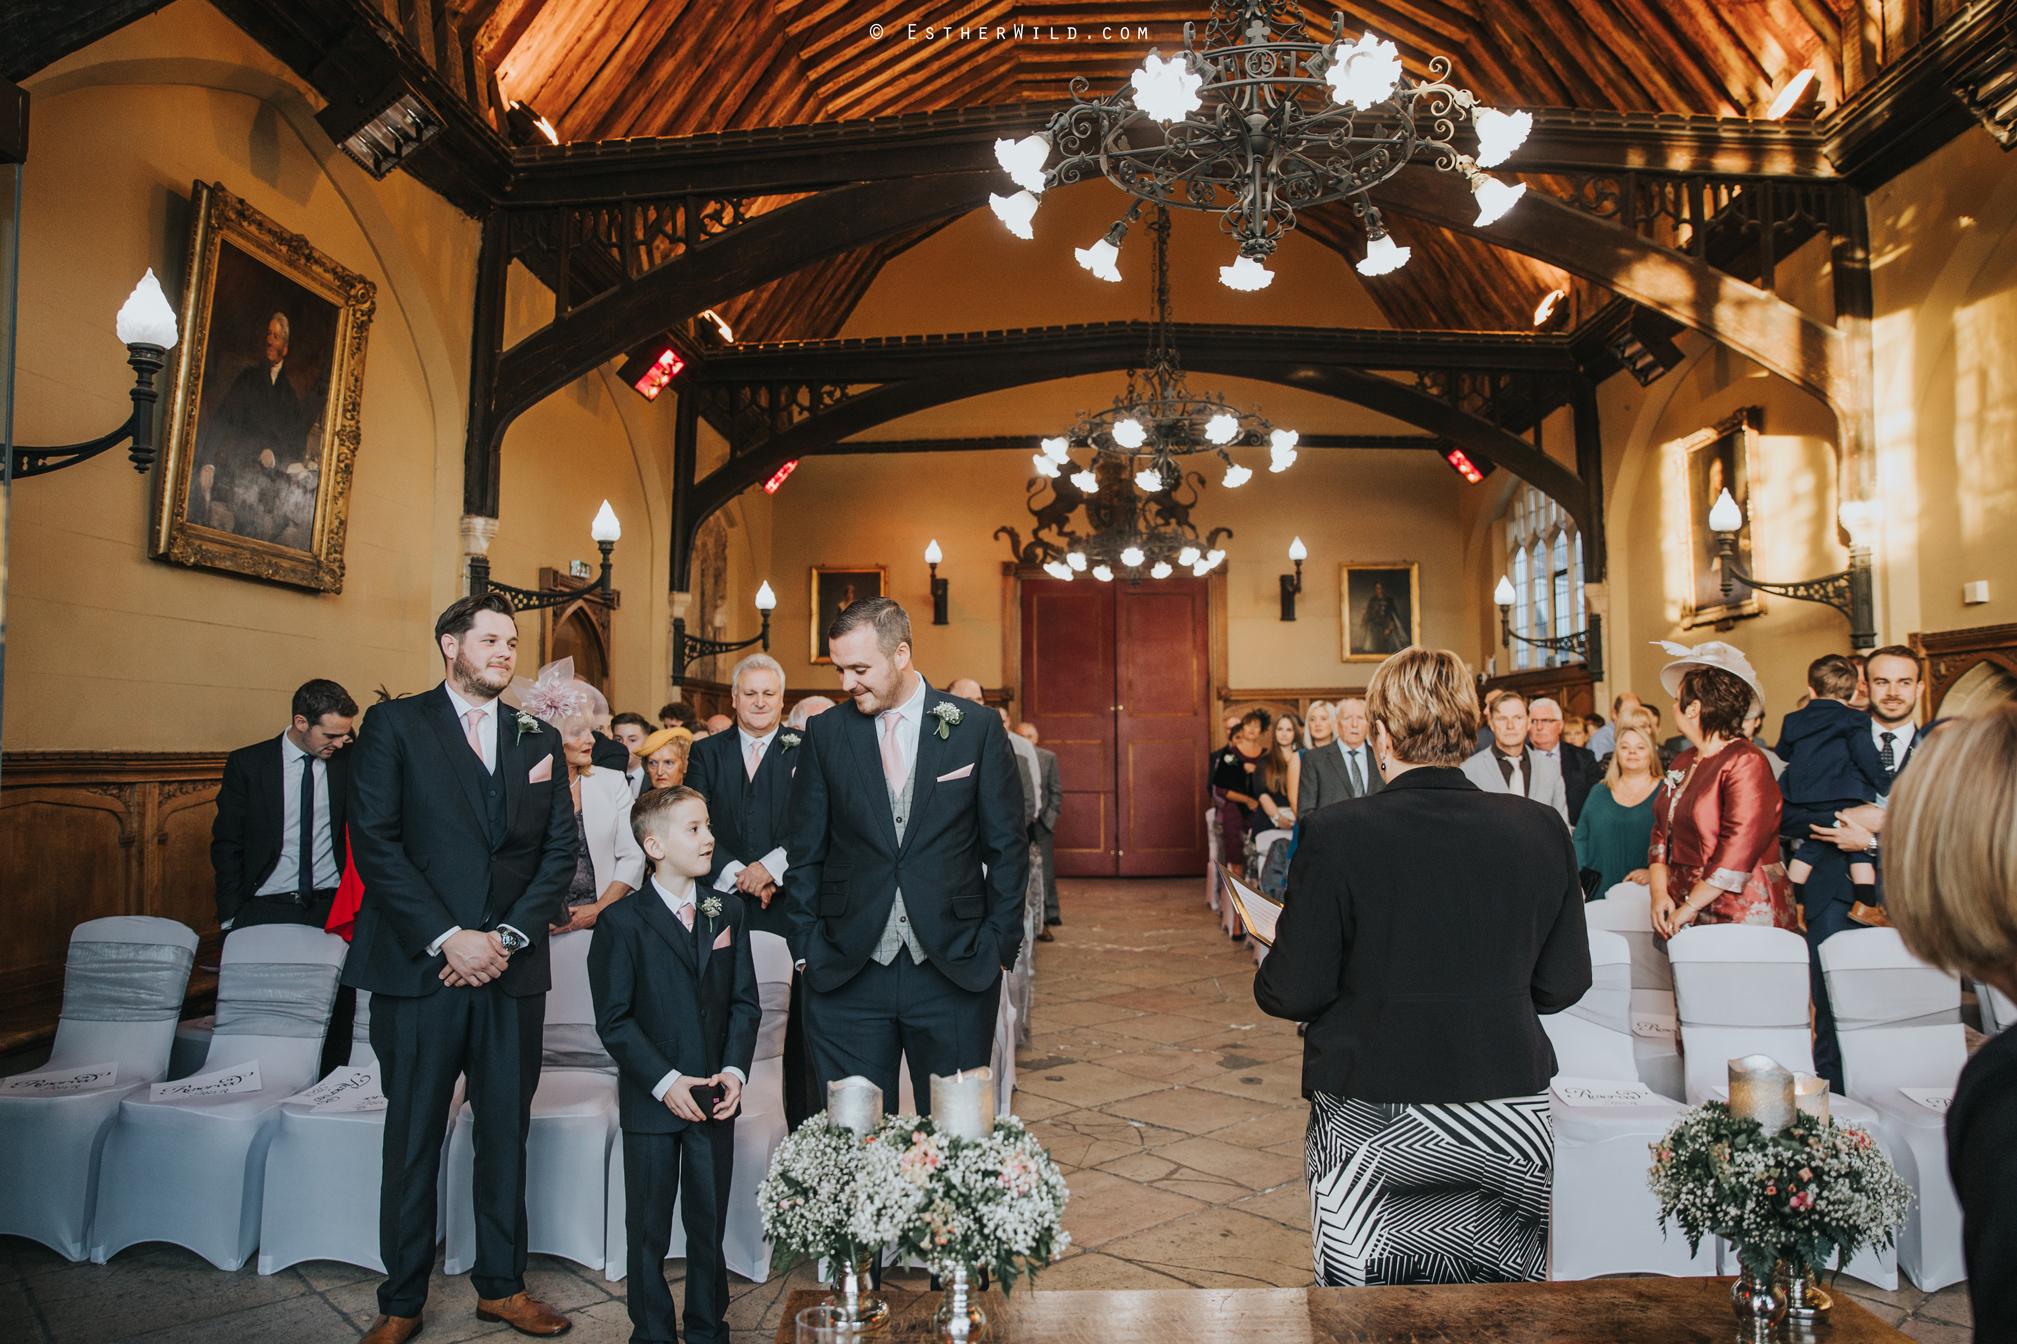 Wedding_Kings_Lynn_Town_Hall_Norfolk_Photographer_Esther_Wild_IMG_0903.jpg